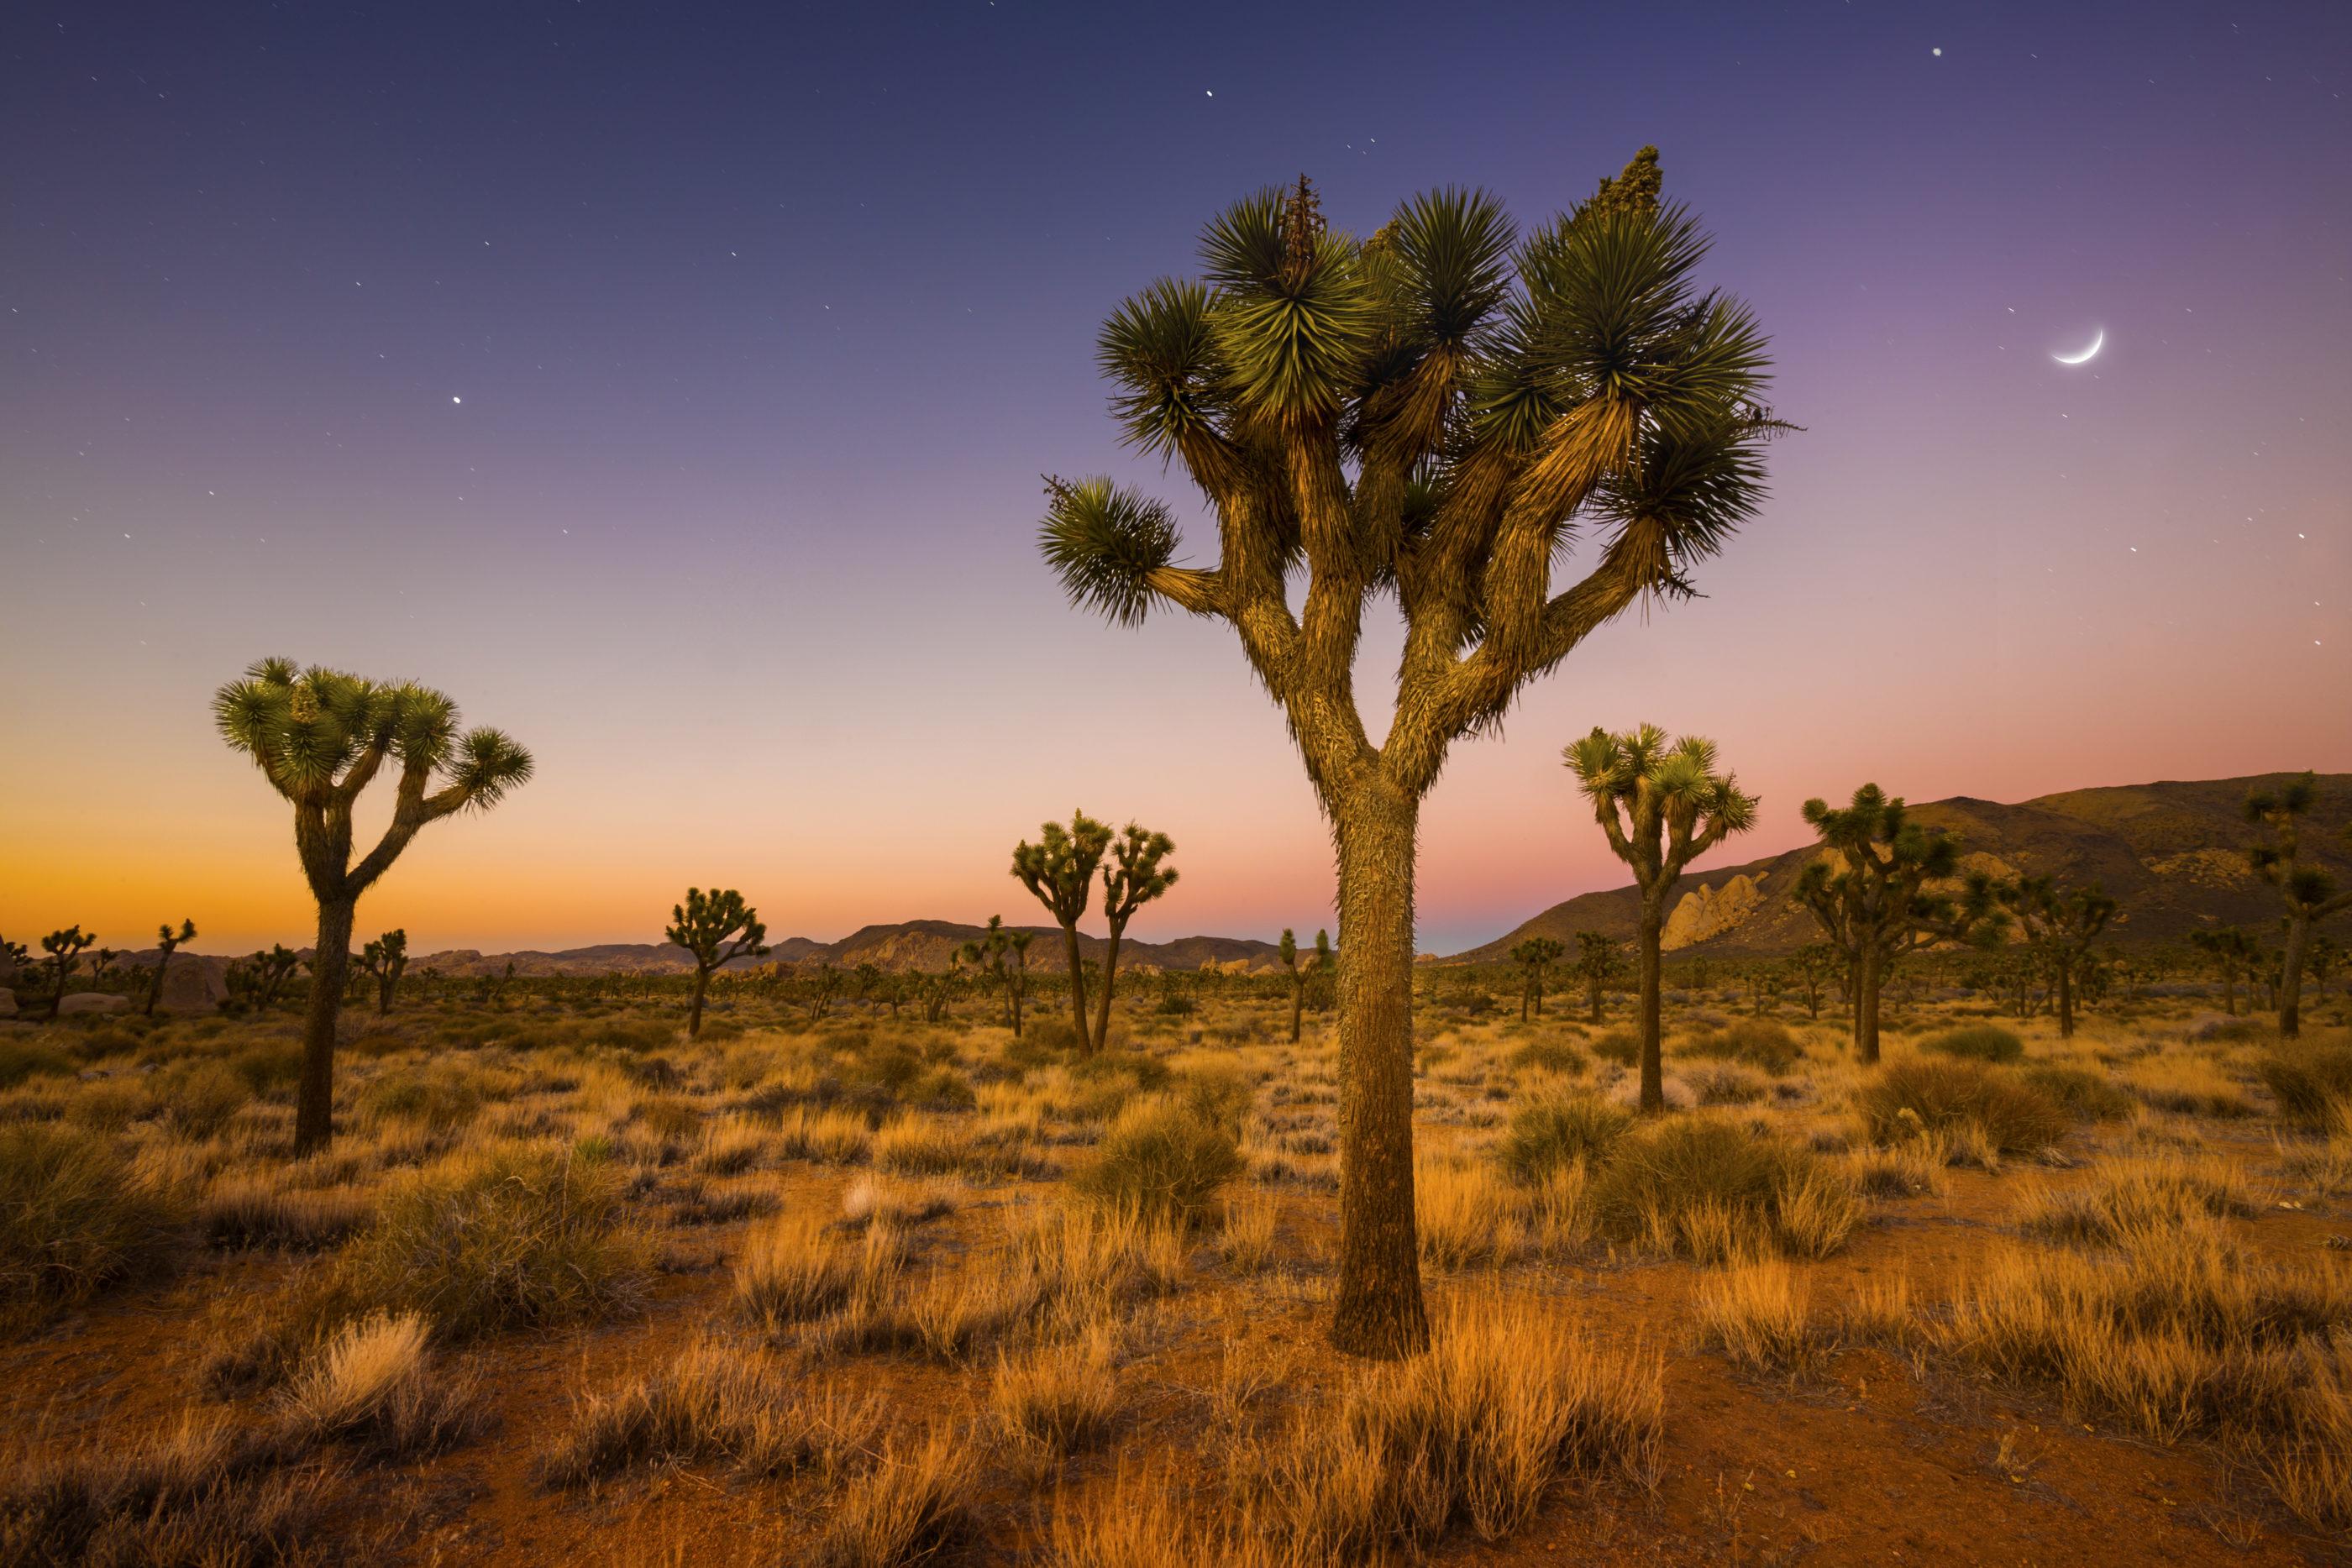 Joshua trees in a field at dusk at Joshua Tree National Park.